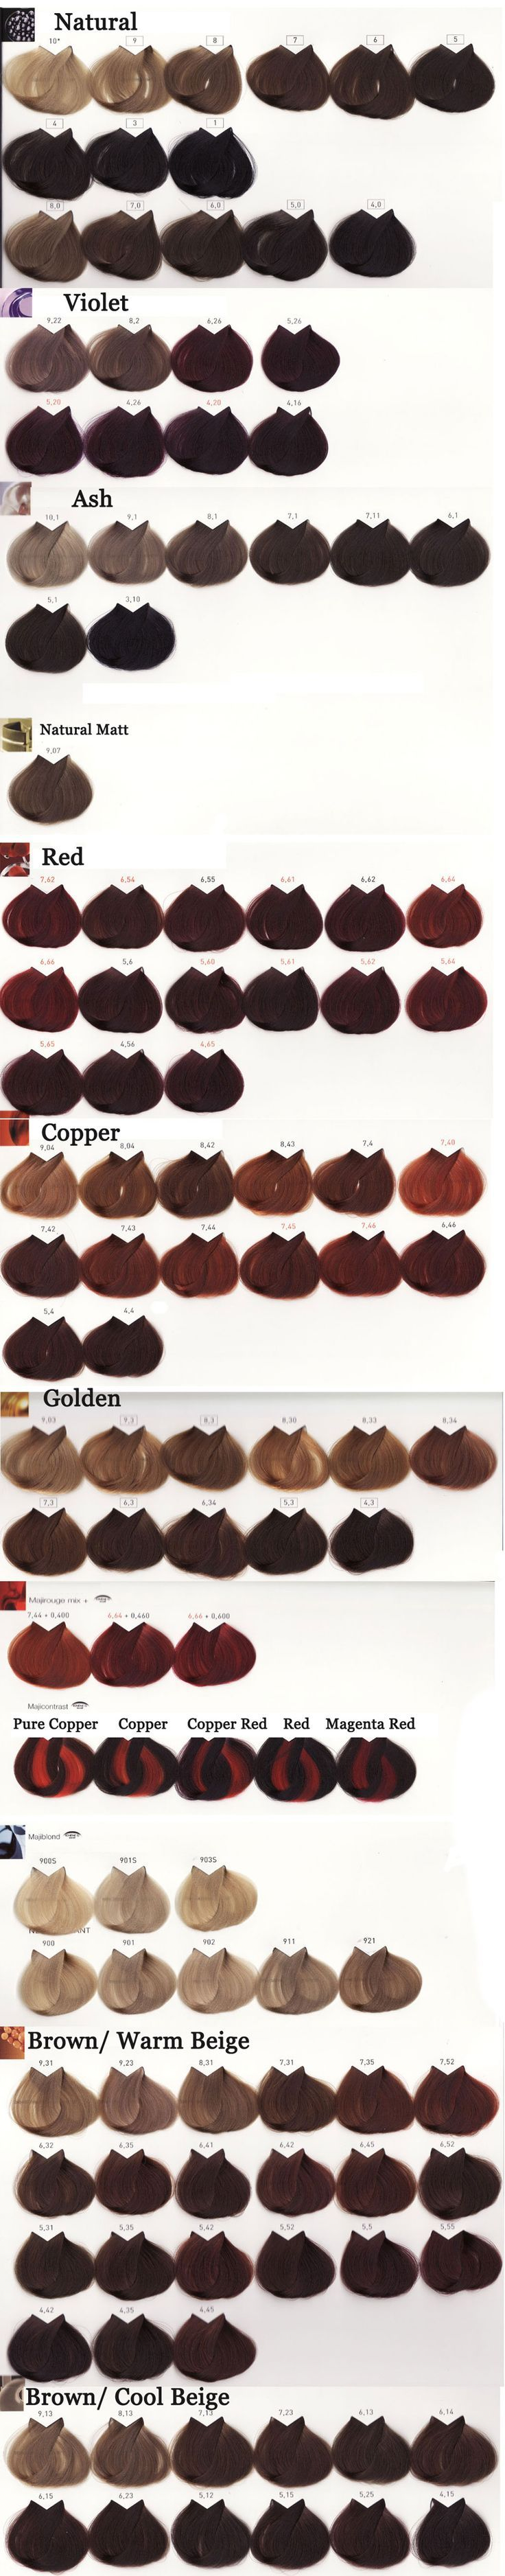 Loreal Majirel Color Chart Hair Color Chart Loreal Hair Color Chart Hair Color Chart Loreal Hair Color